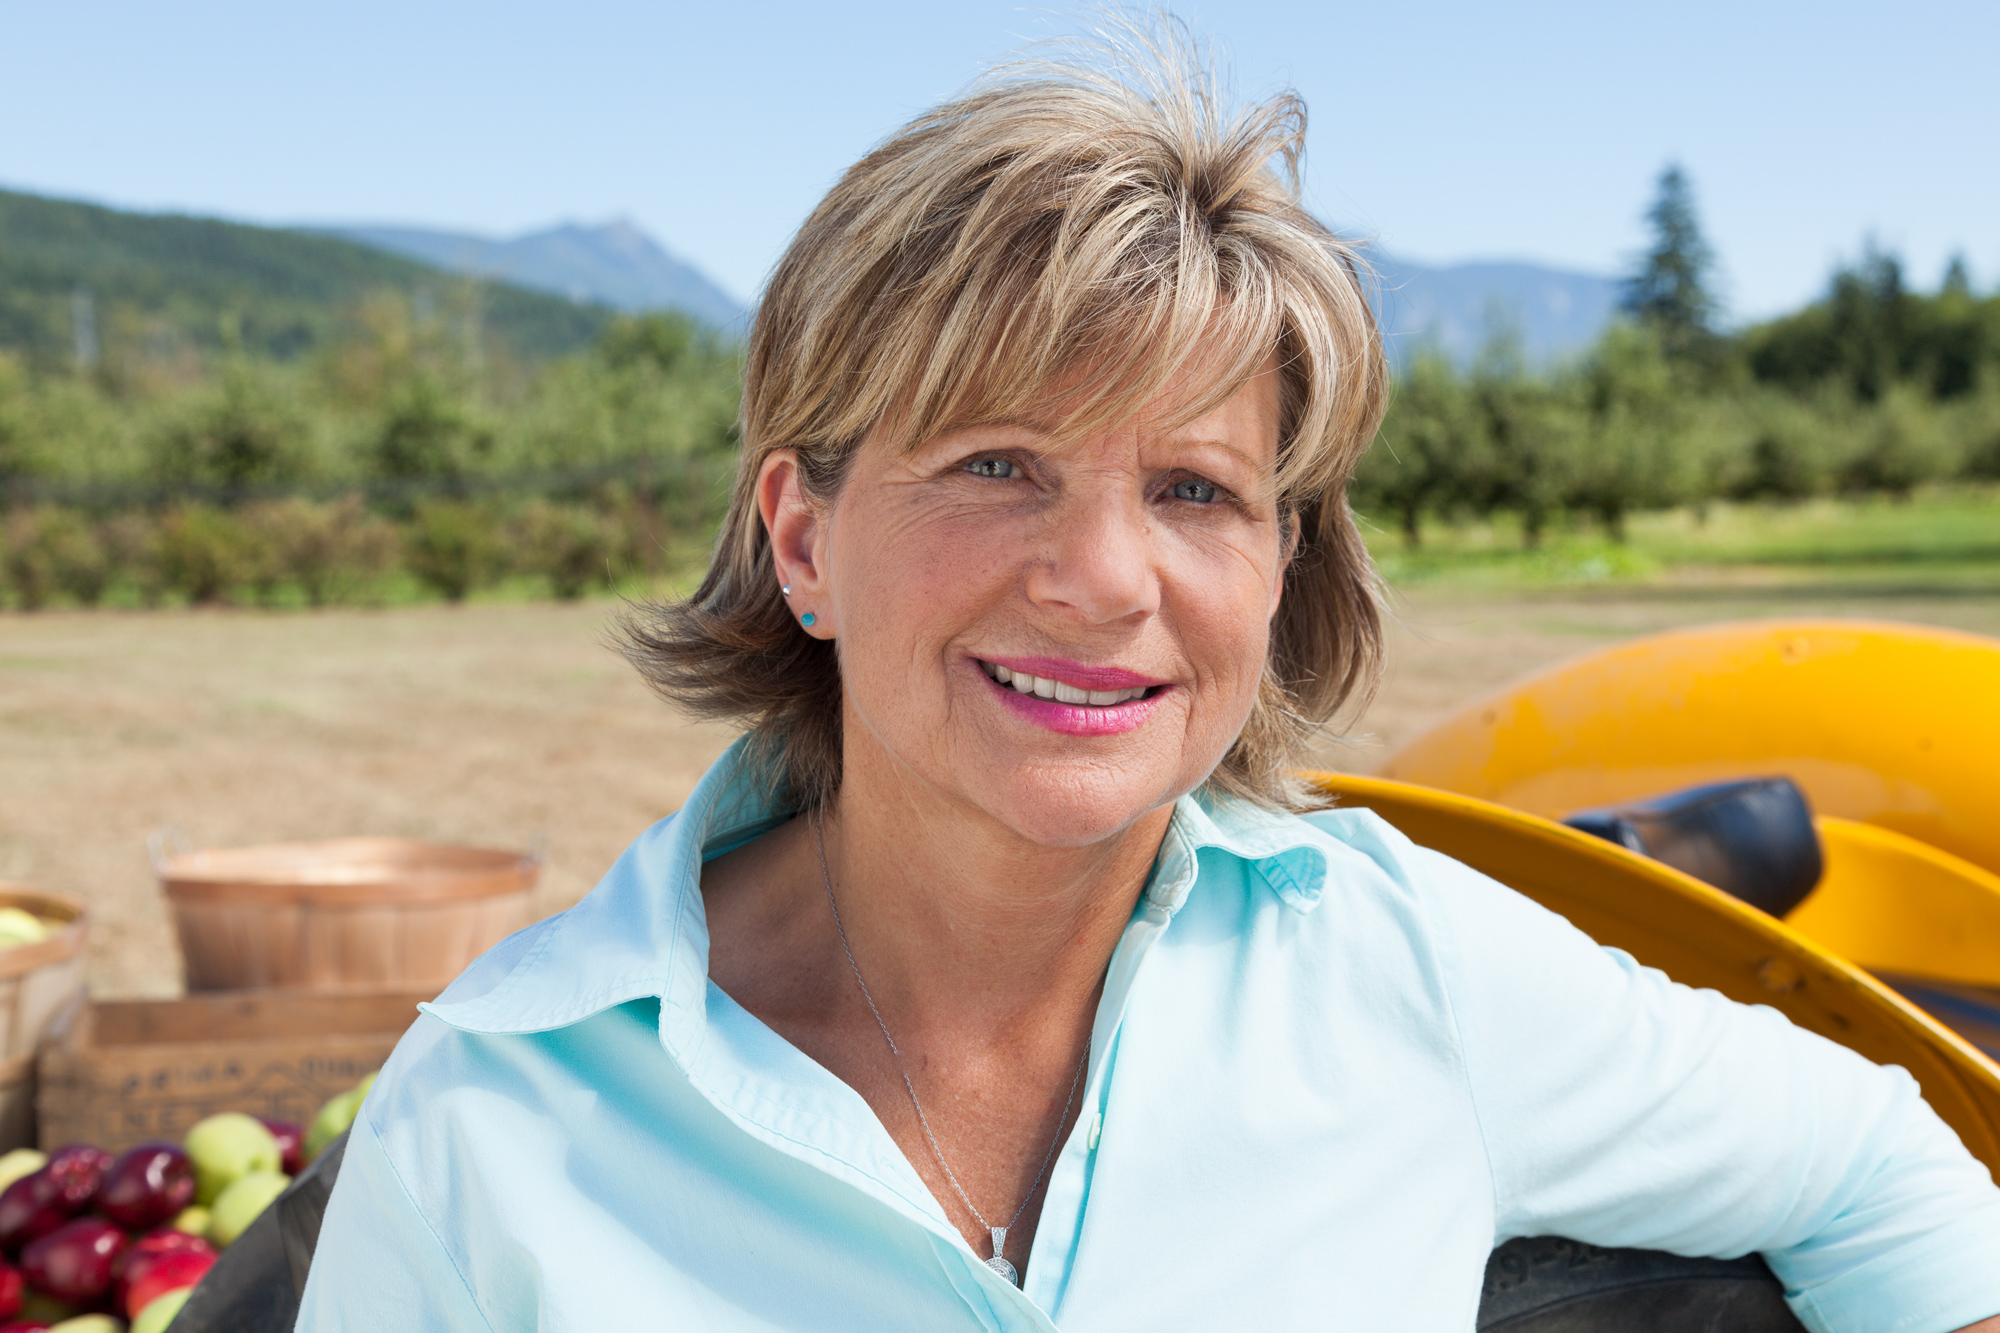 Apple farmer Roxanne Haussman, client: Winner & Mandalbach